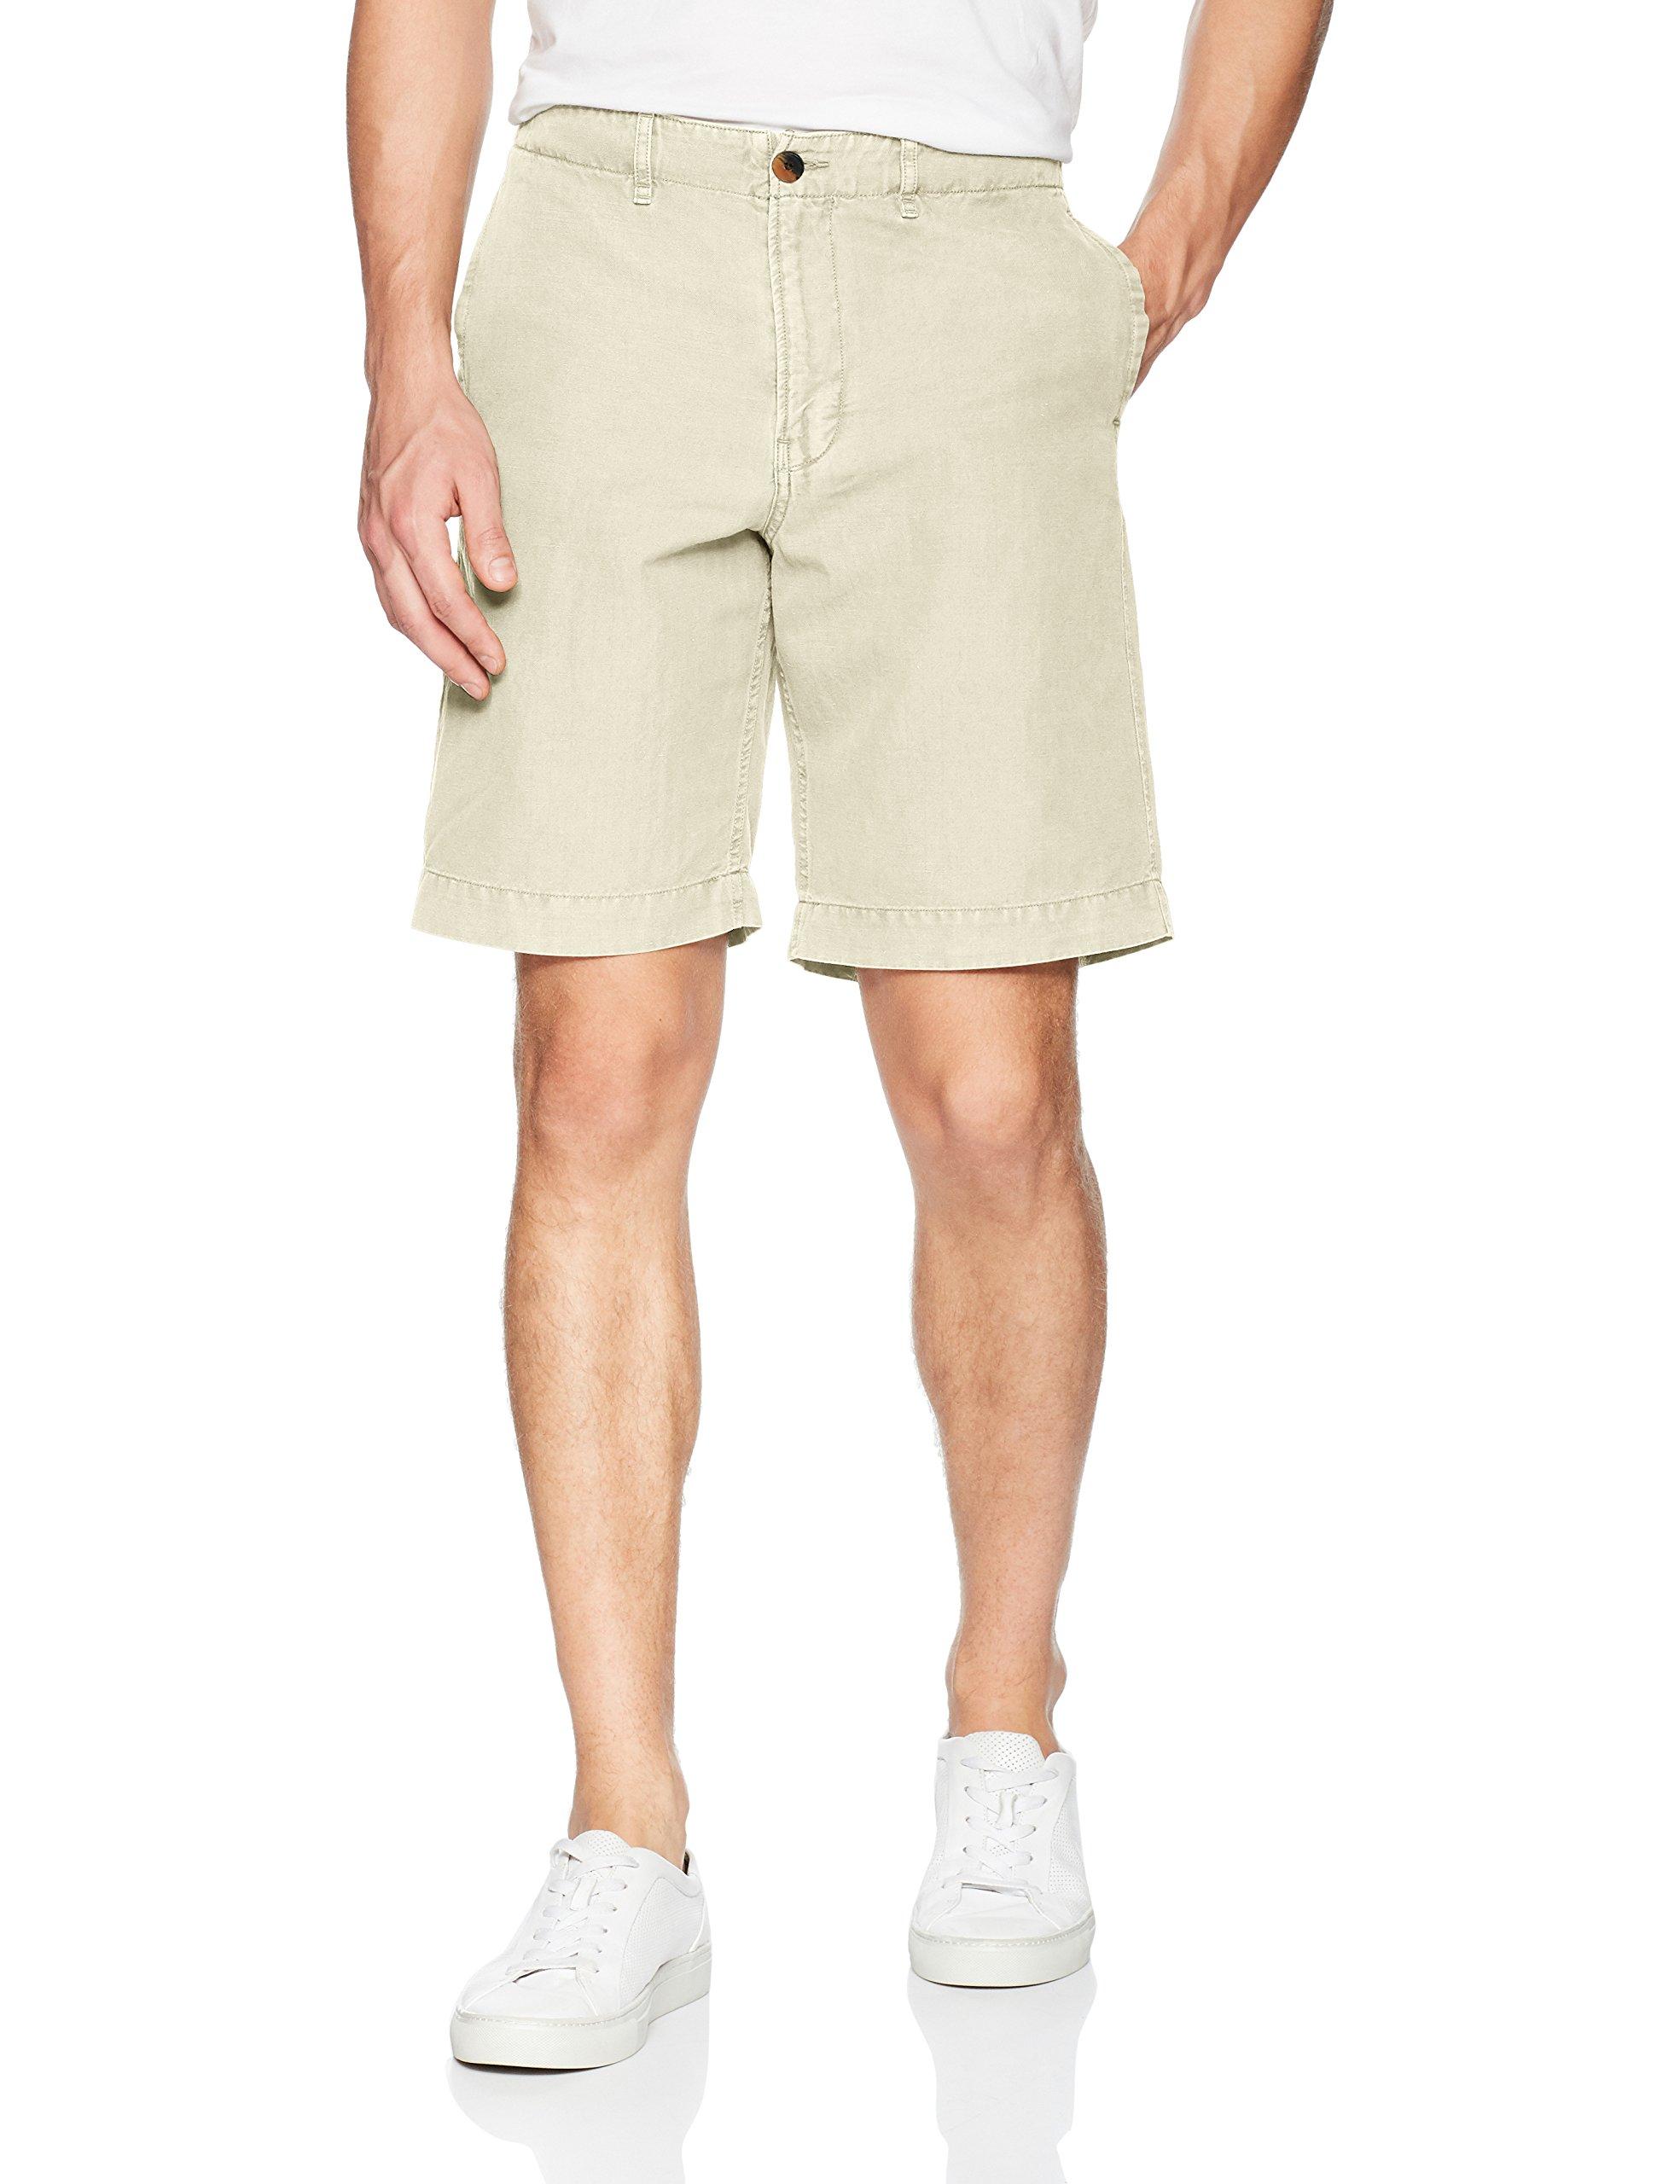 Billy Reid Men's Clyde Chino Shorts, Eggshell, 32